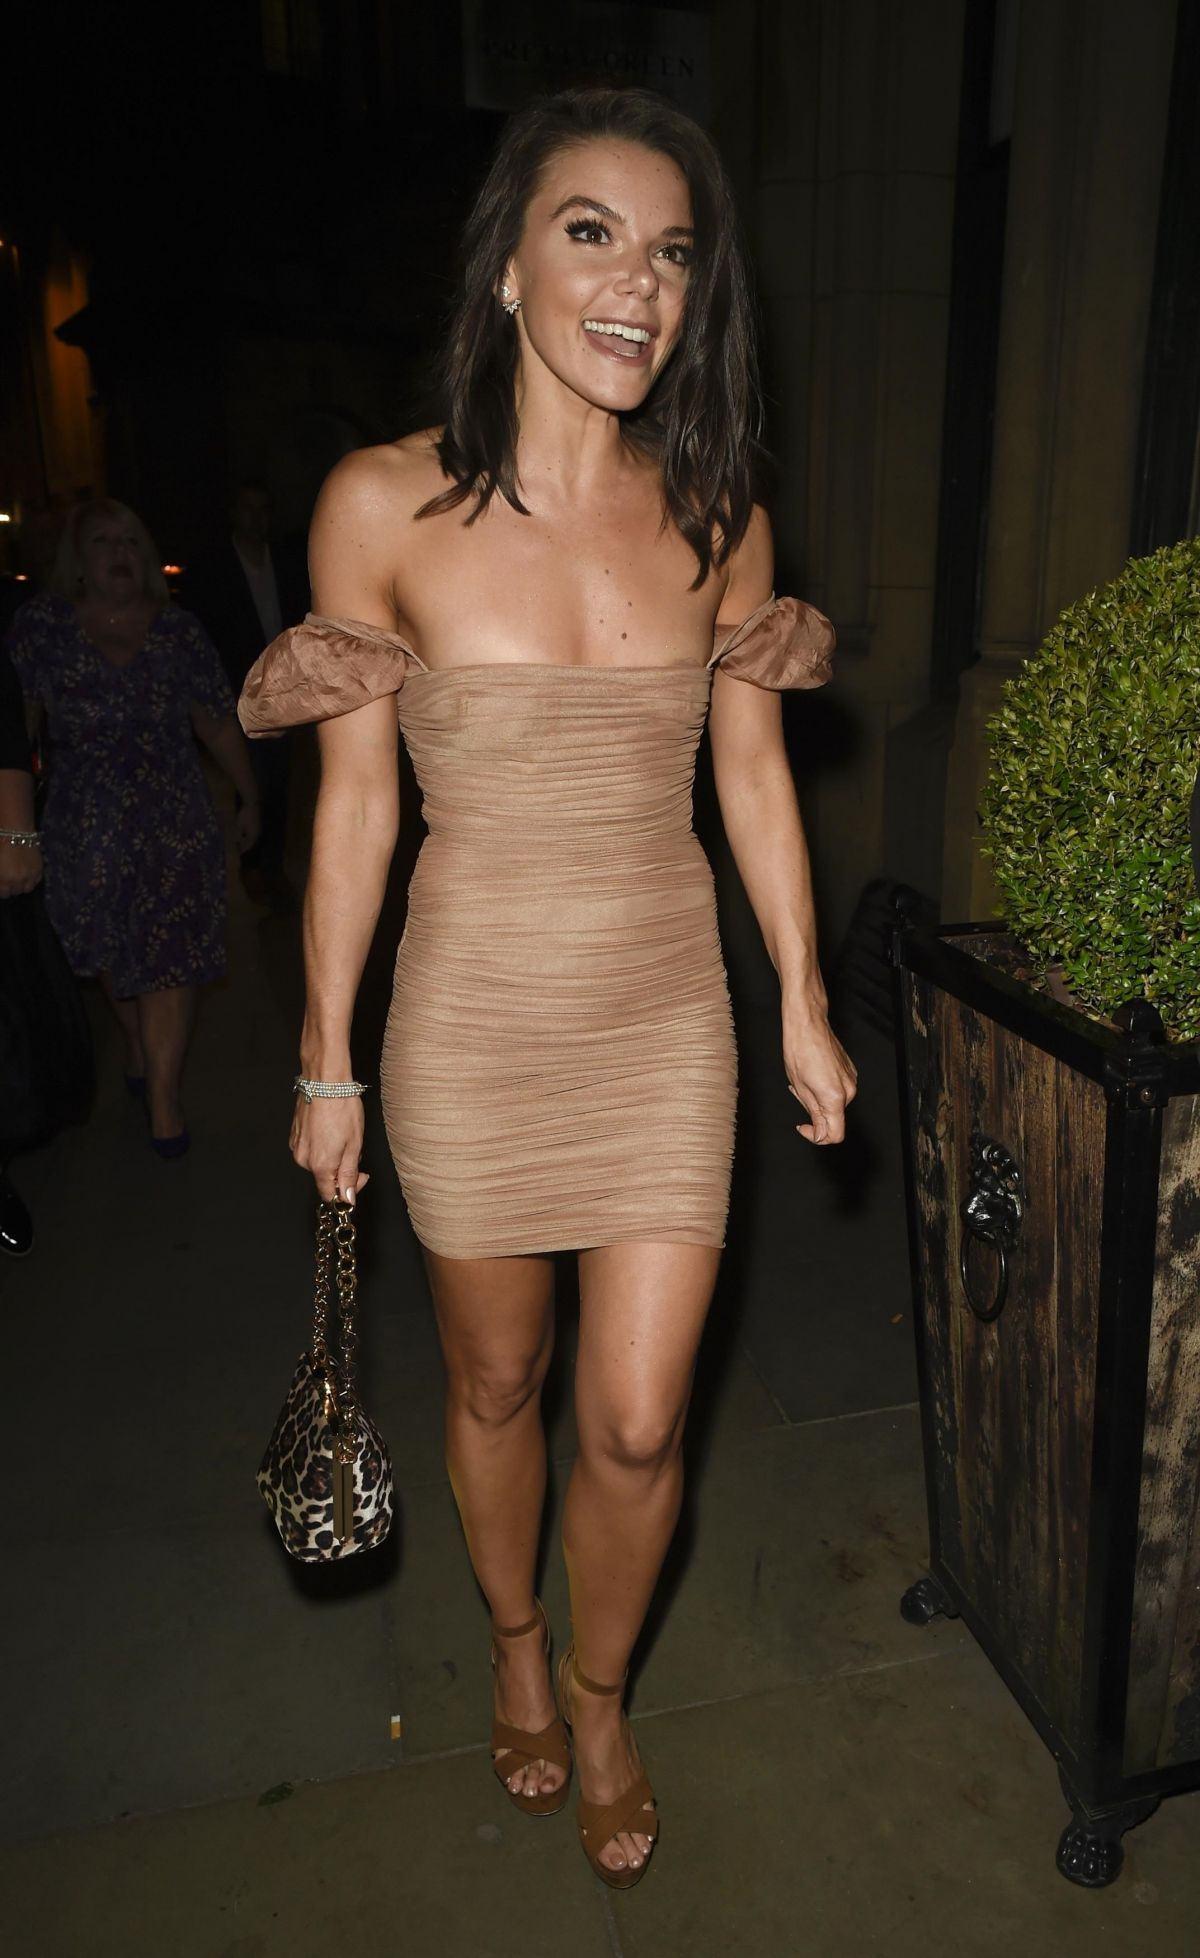 Faye Brookes nipple slip and bikini photos - Thefappening.link